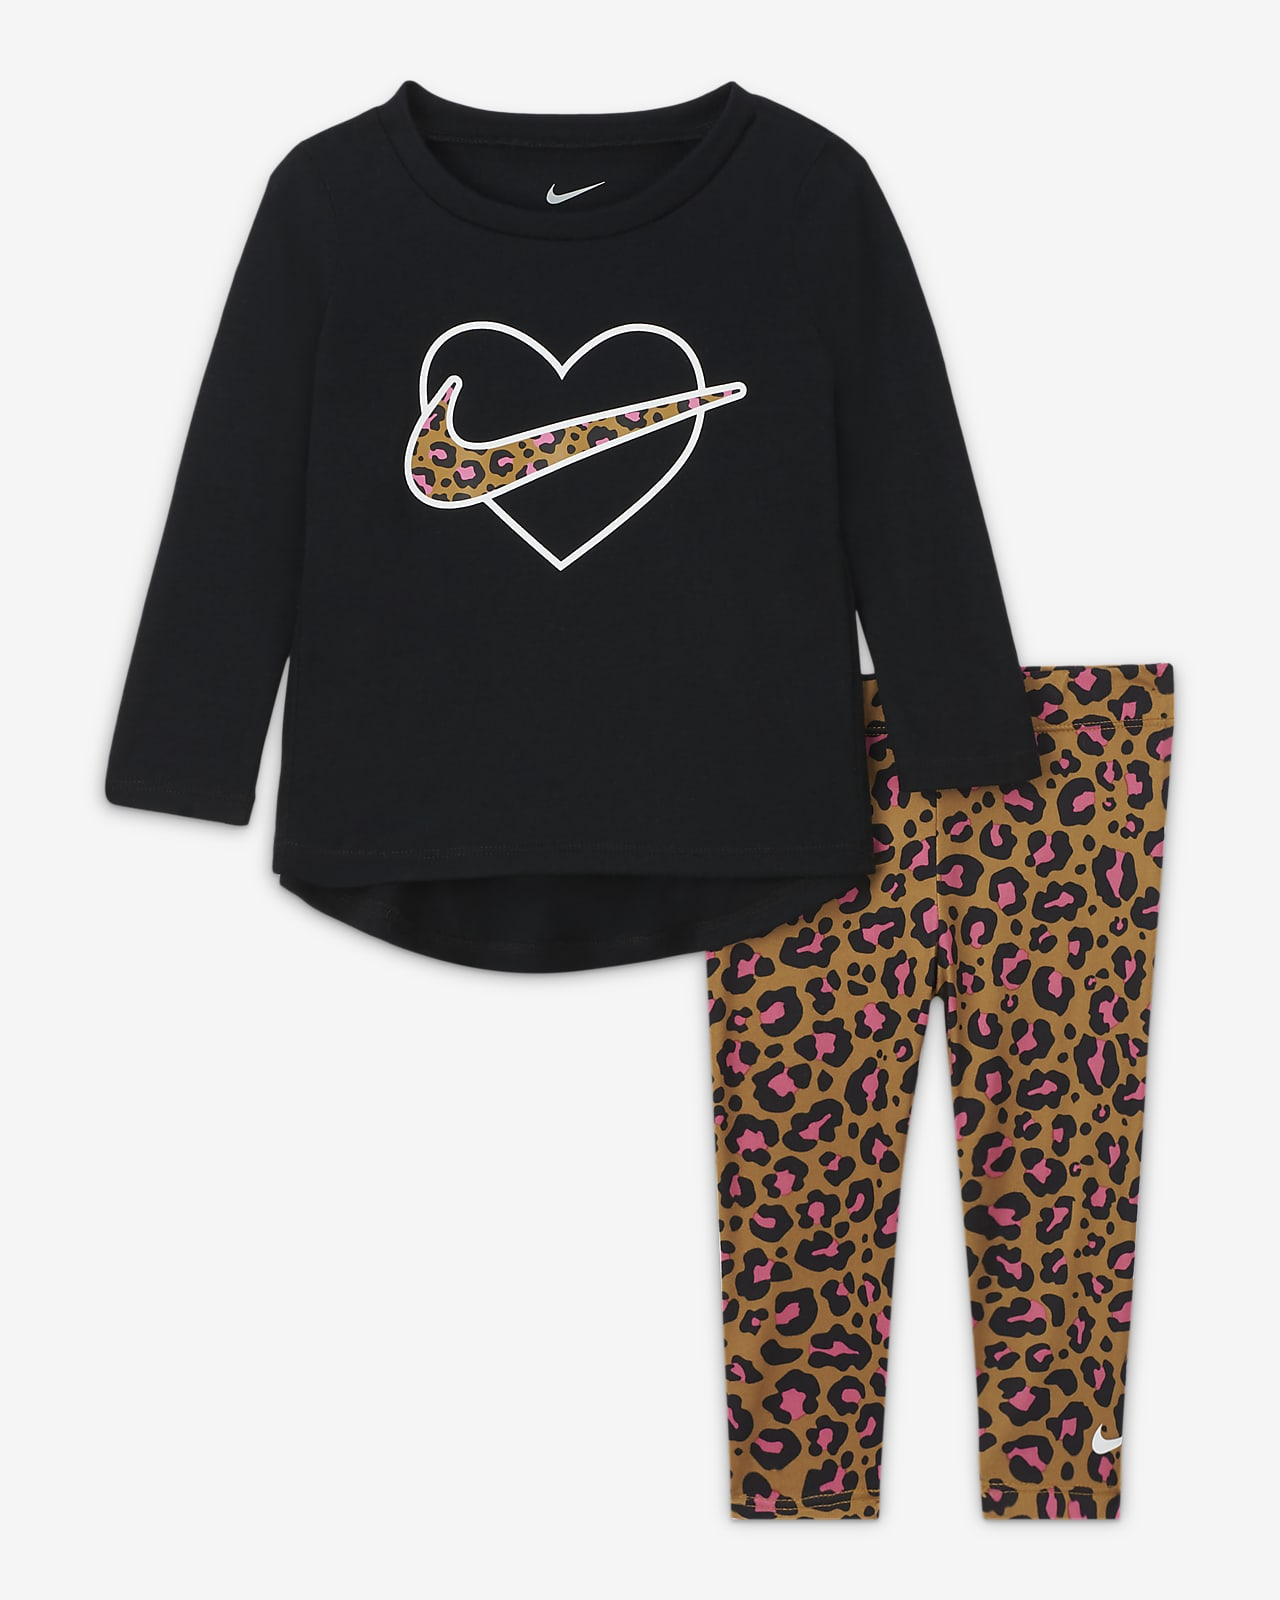 Completo maglia e leggings Nike - Neonati (12-24 mesi)